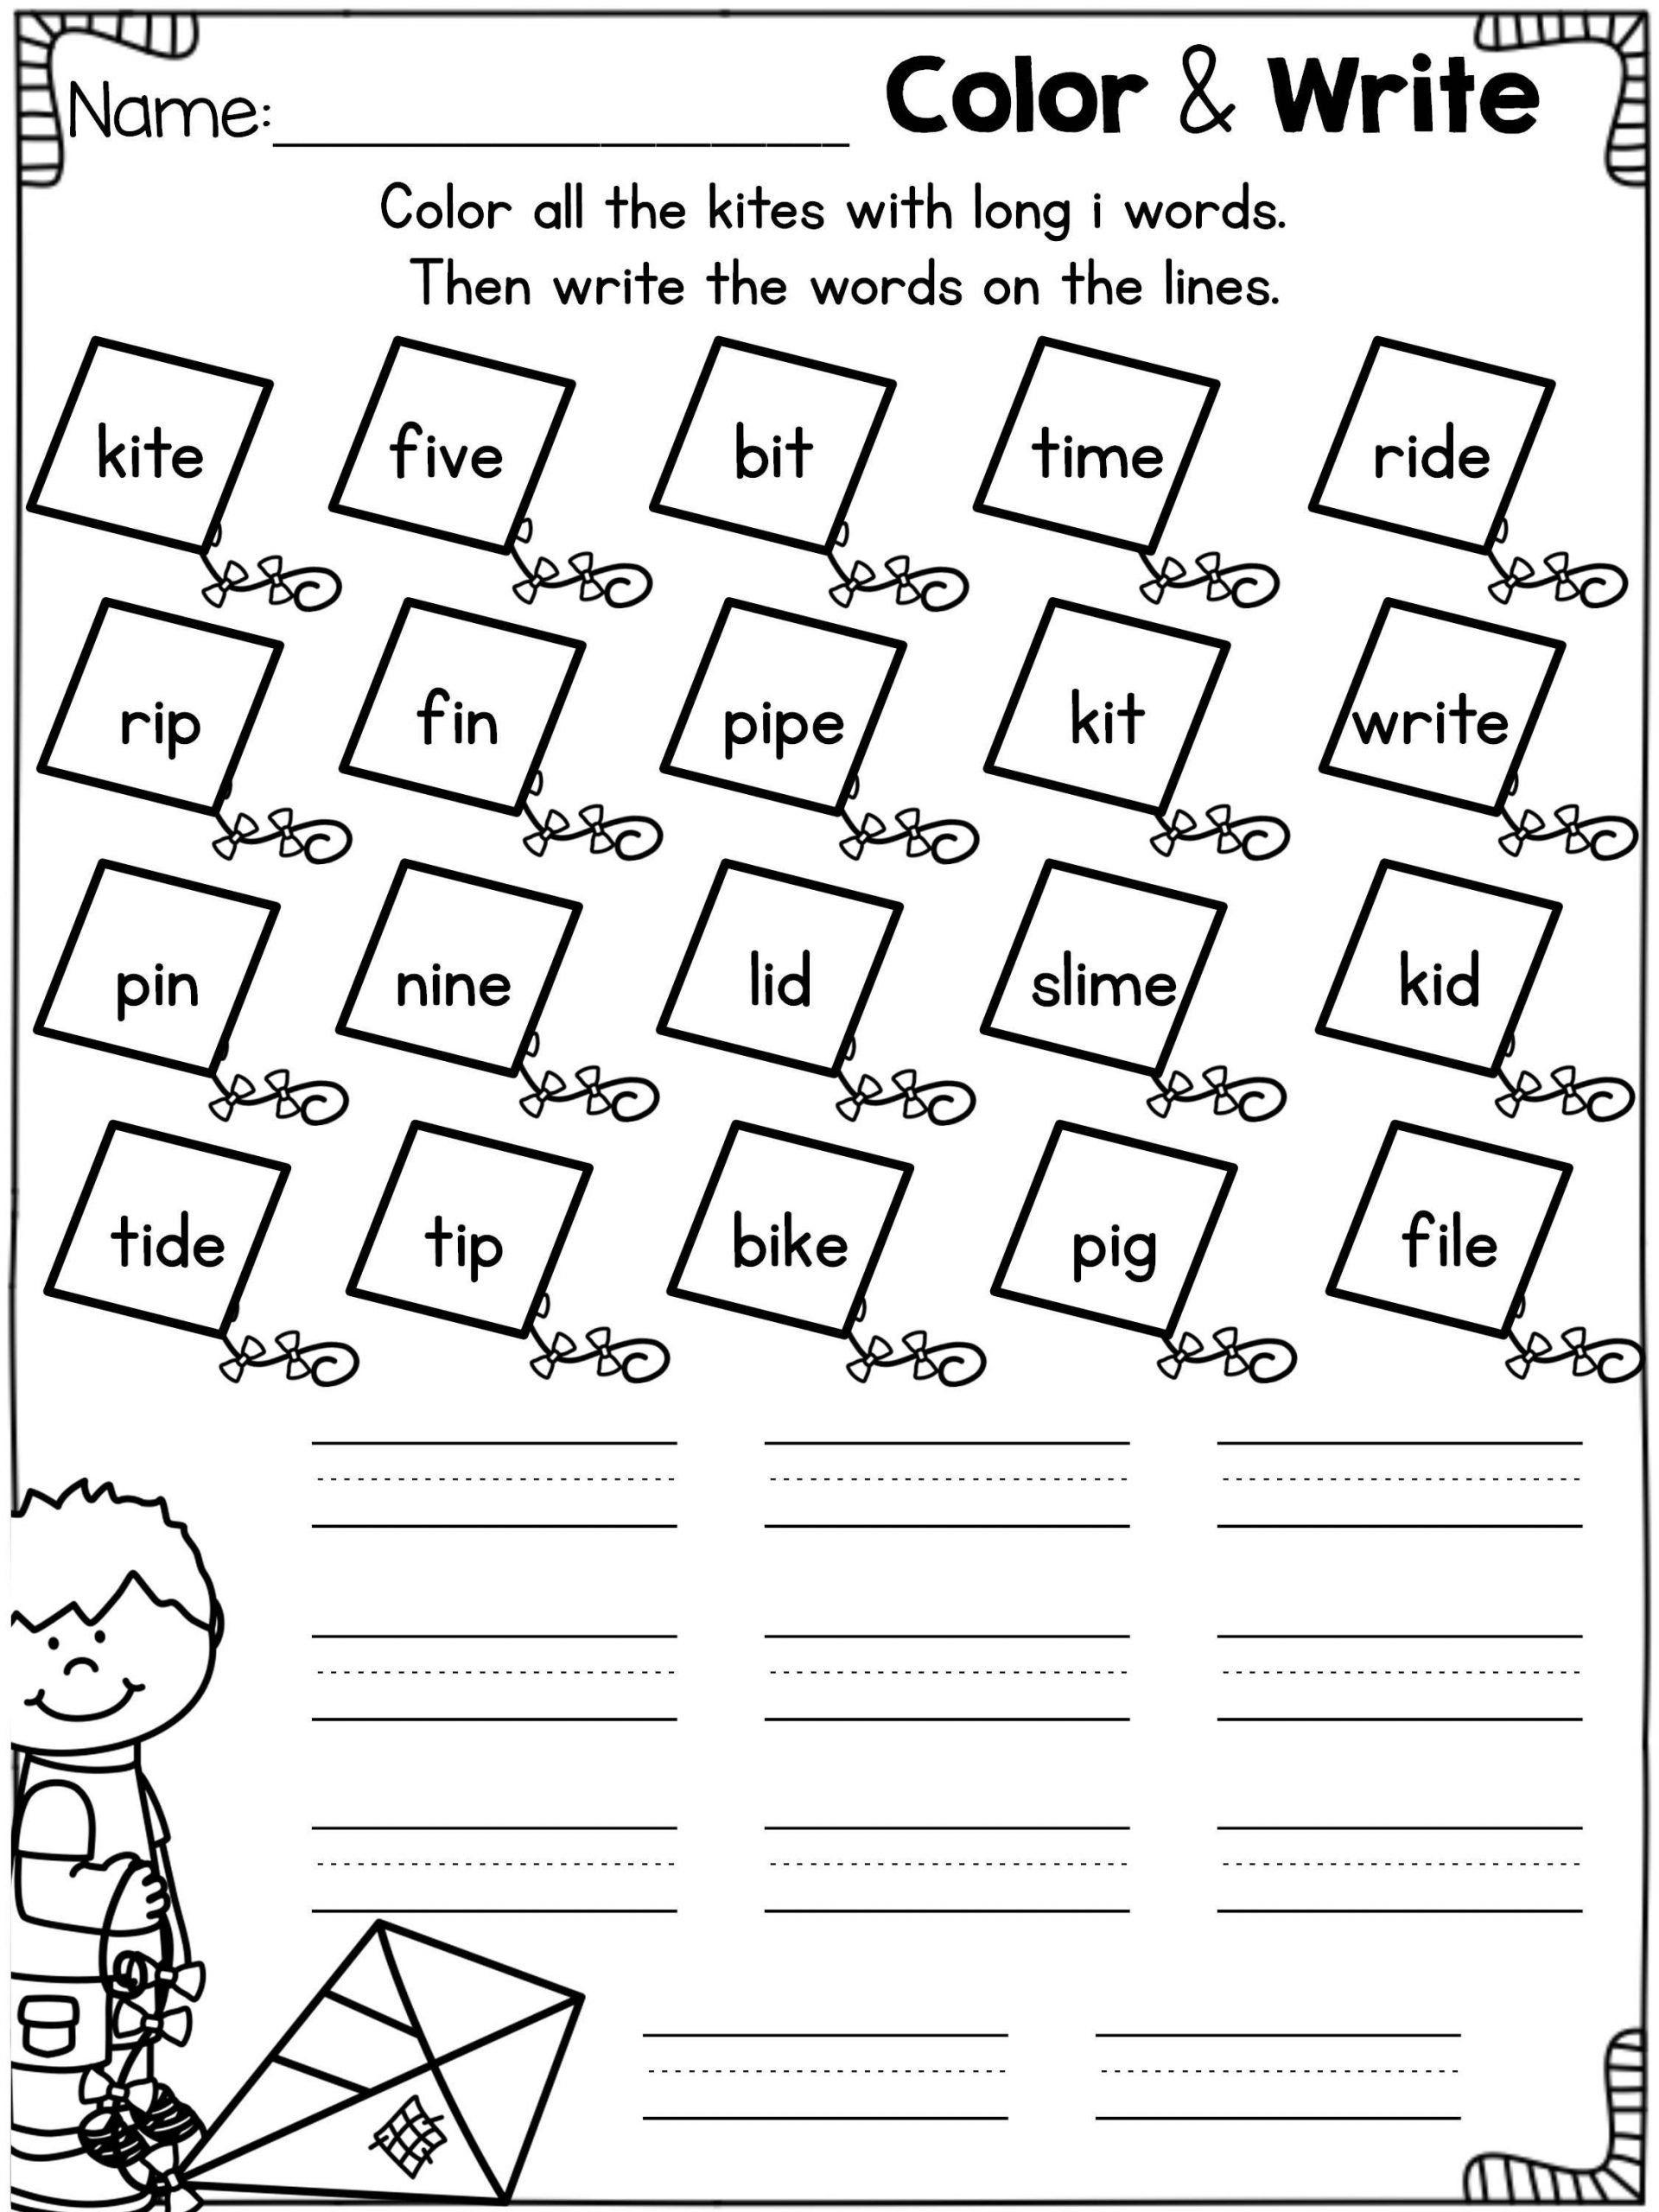 Silent E Worksheets For Kindergarten Long Vowel Worksheets And Activities Cvce Words Bundle Long Vowel Worksheets Vowel Worksheets Phonics Worksheets [ 2560 x 1920 Pixel ]